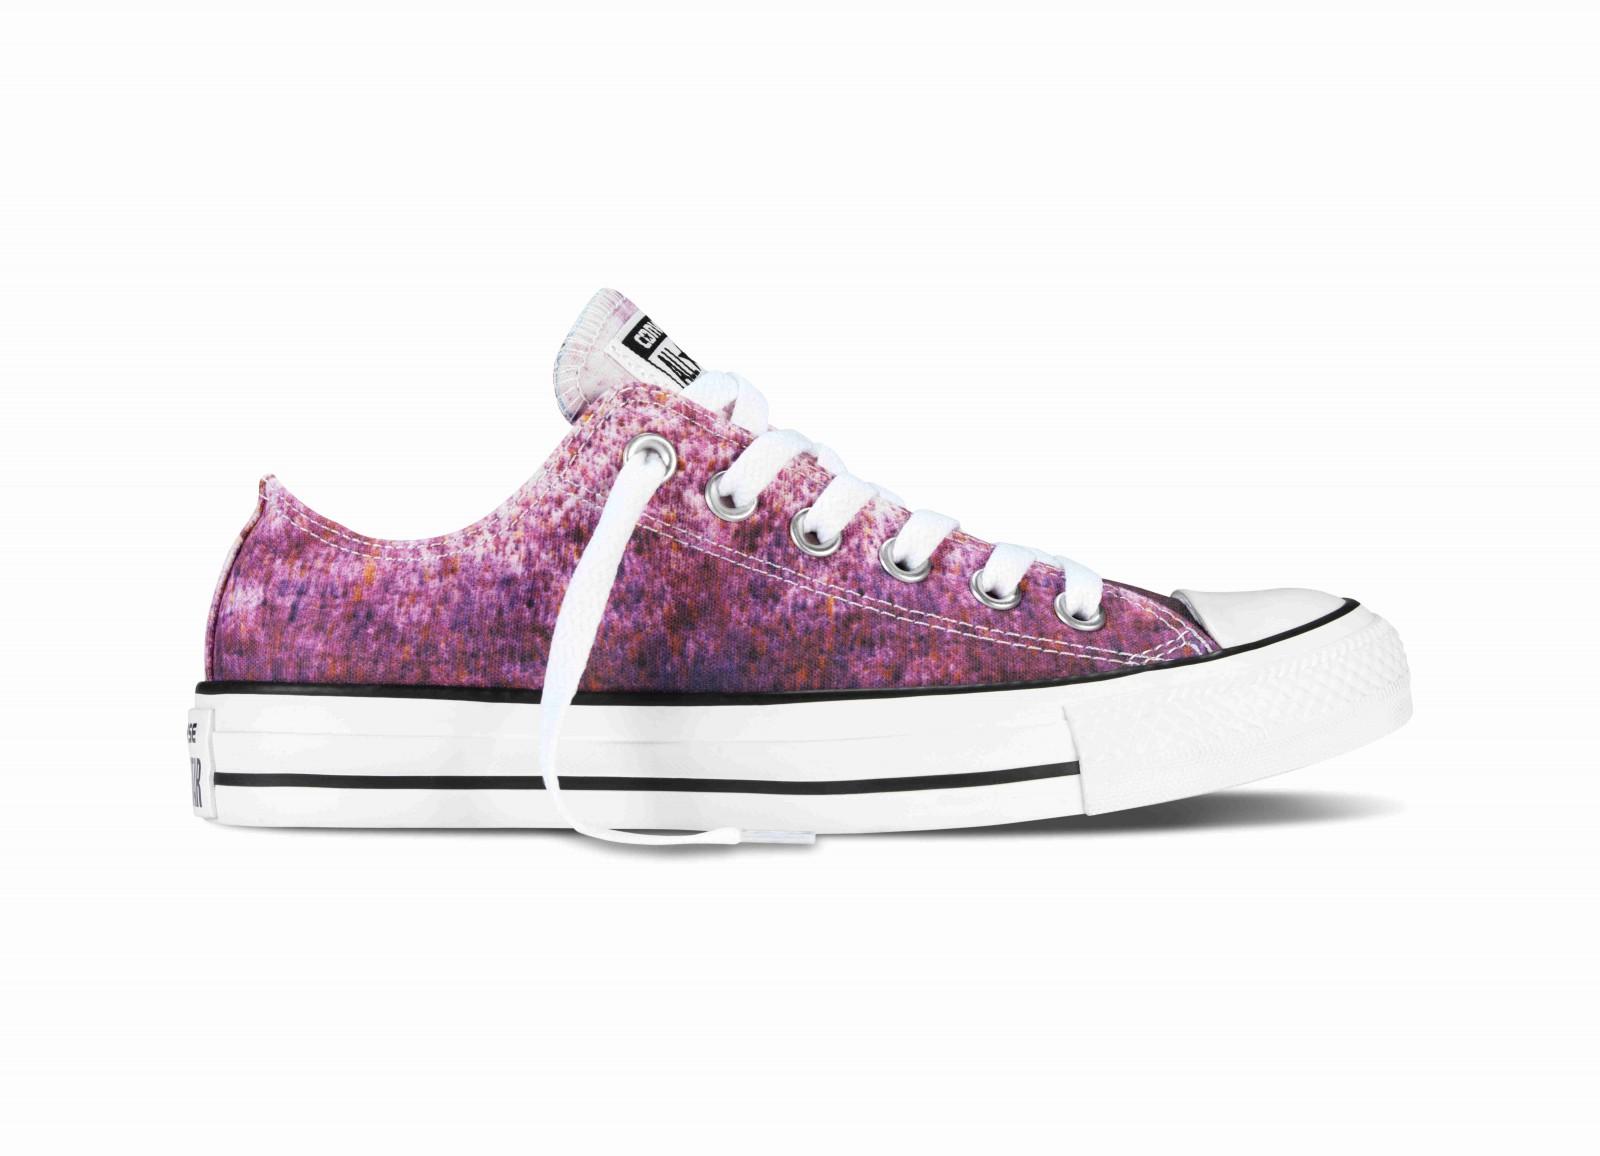 186c4a573e3 Dámské boty Converse Chuck Taylor All Star fialový print